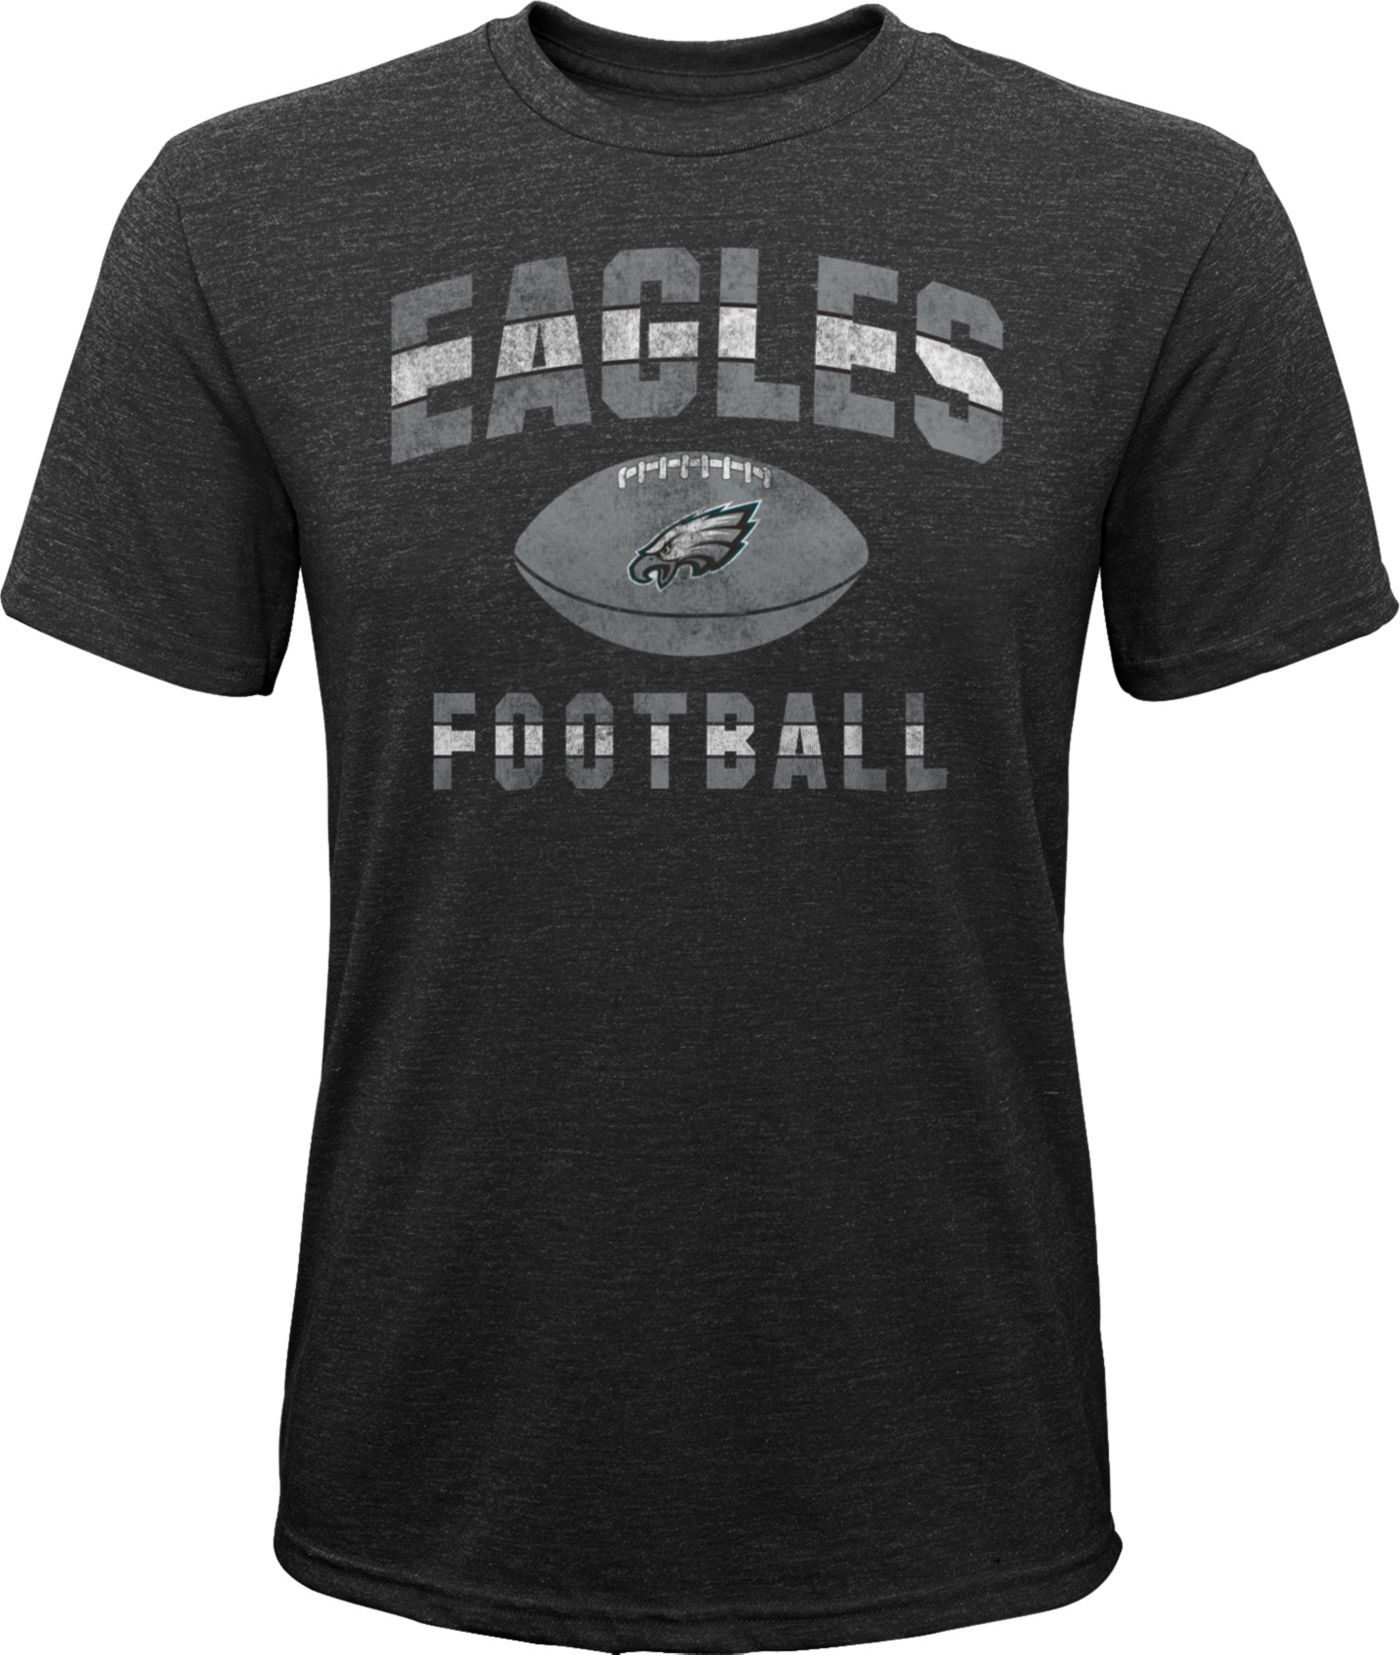 NFL Team Apparel Youth Philadelphia Eagles Big Game Tri-Blend Black T-Shirt